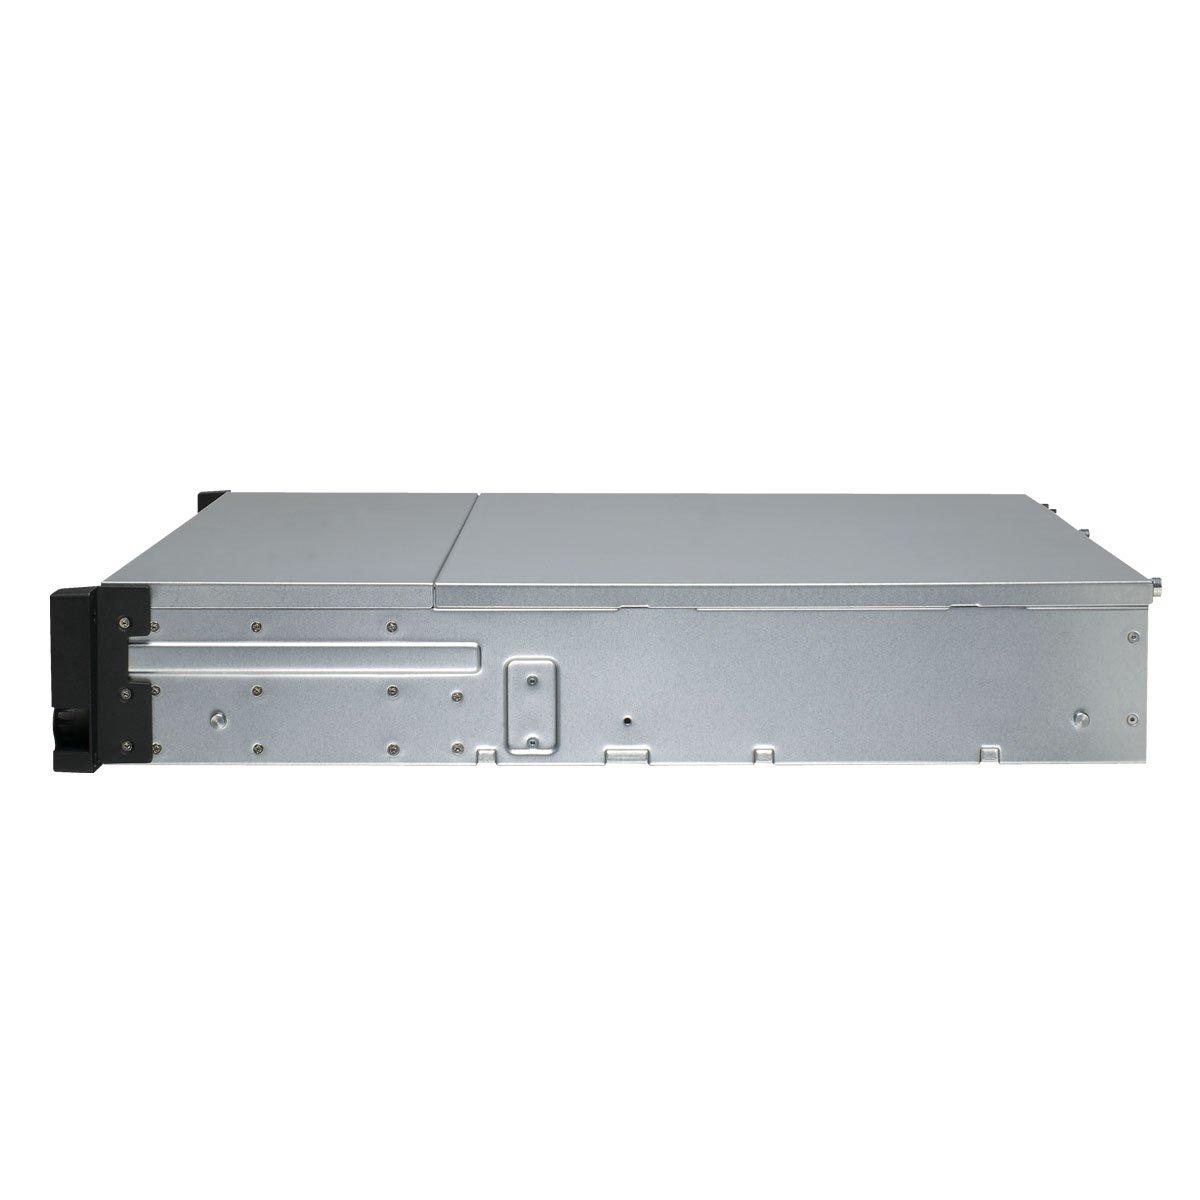 QNAP TS-1253U-RP 12-bay 2U iSCSI NAS, Intel 2.0GHz Quad Core CPU with 4GB RAM, 2.5''/3.5'' SATA 6Gb/s, Hot-swappable, Redundant PSU by QNAP (Image #3)